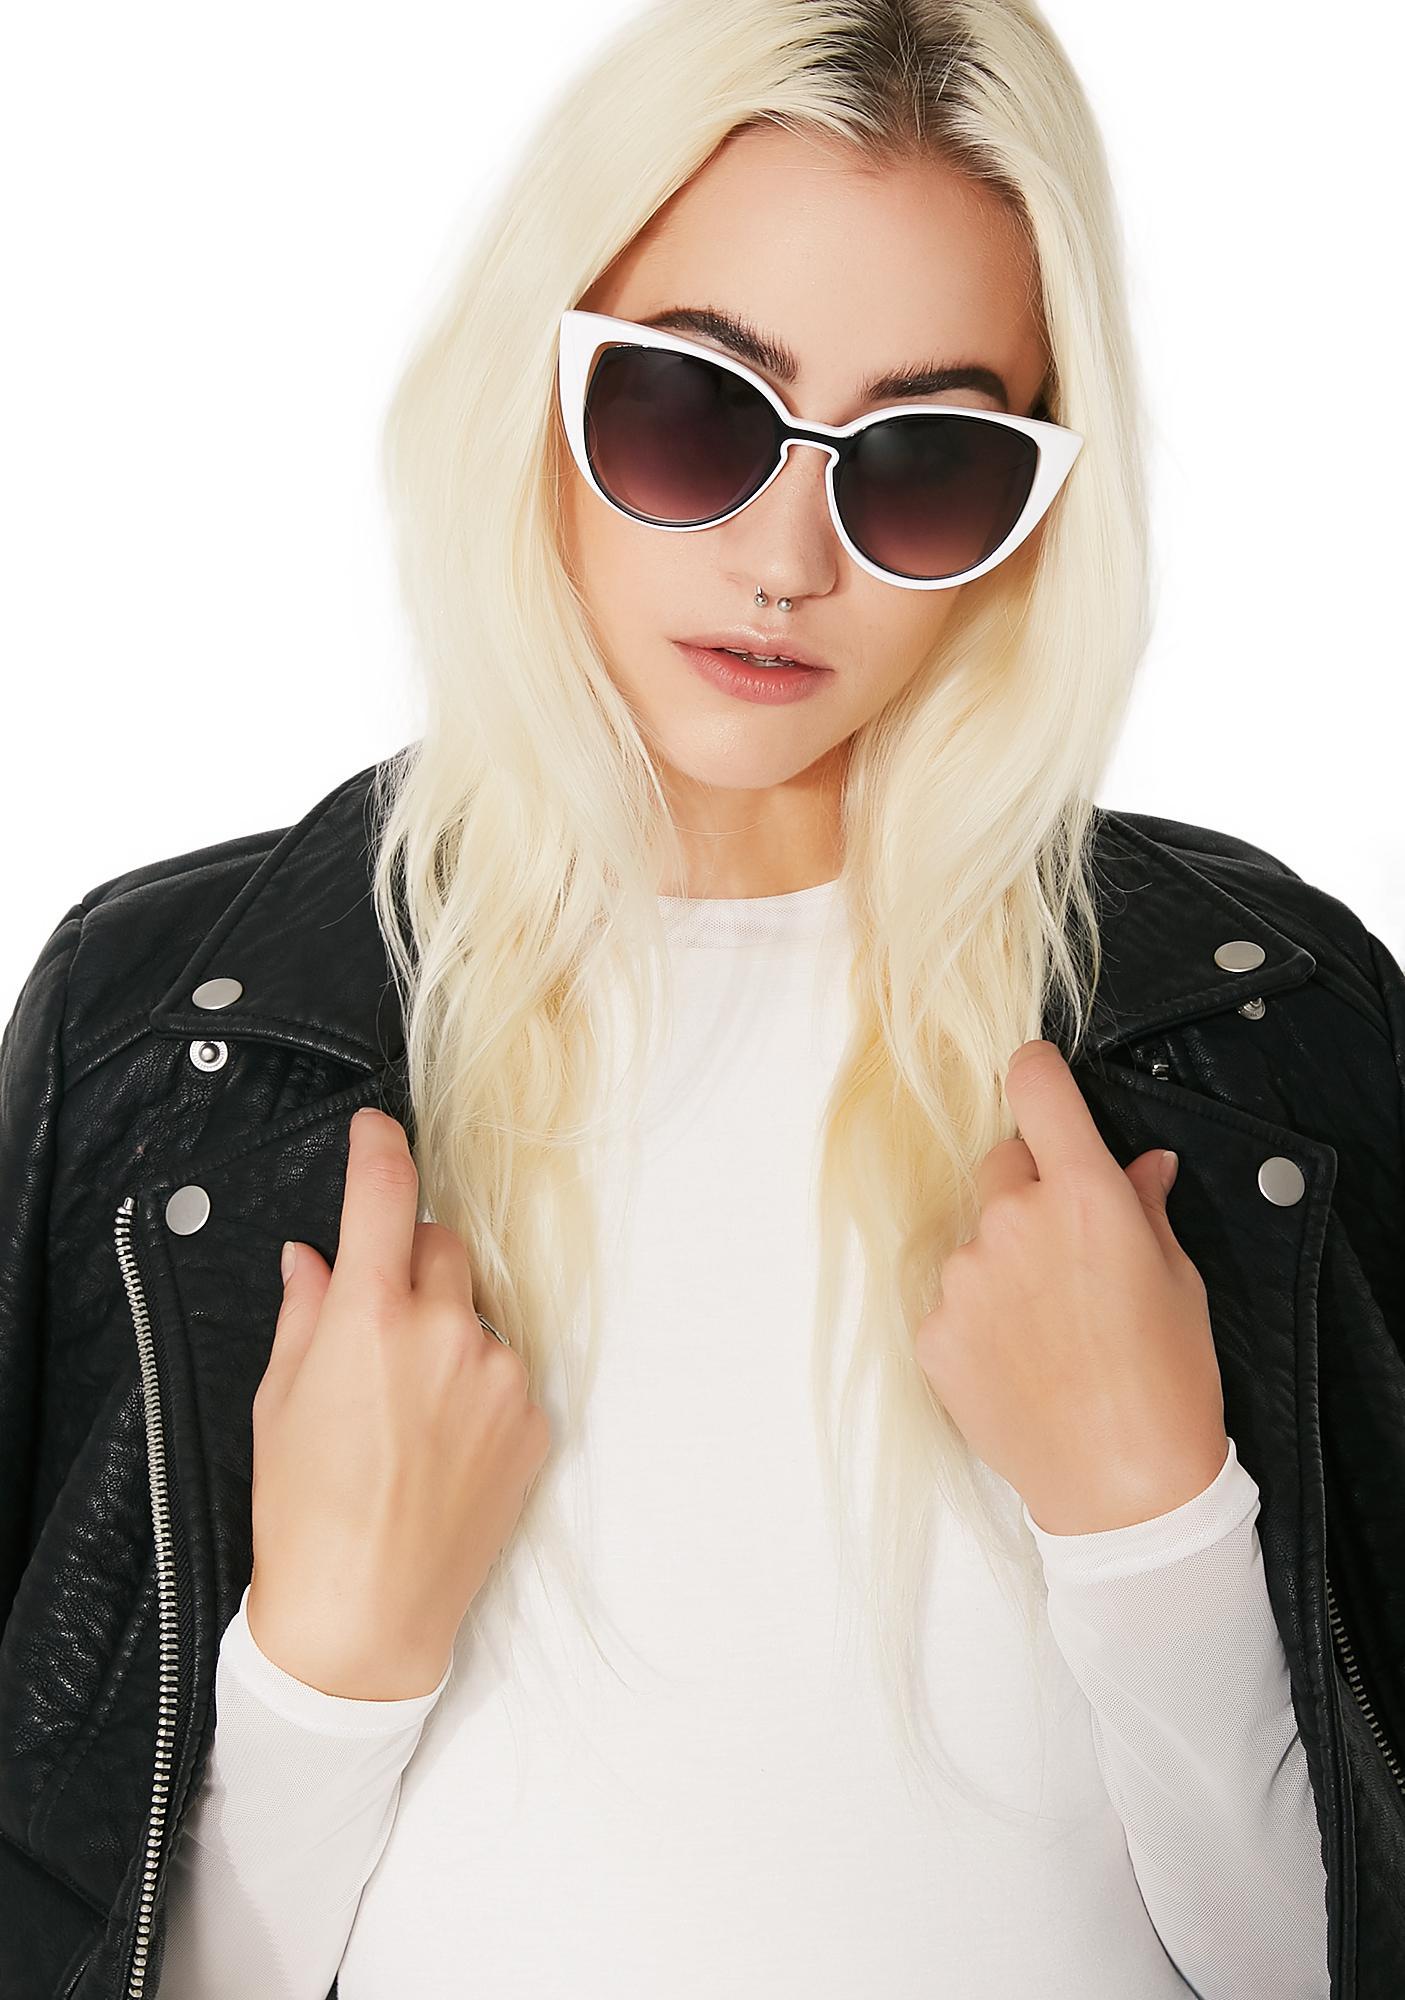 PERVERSE Saga Sunglasses